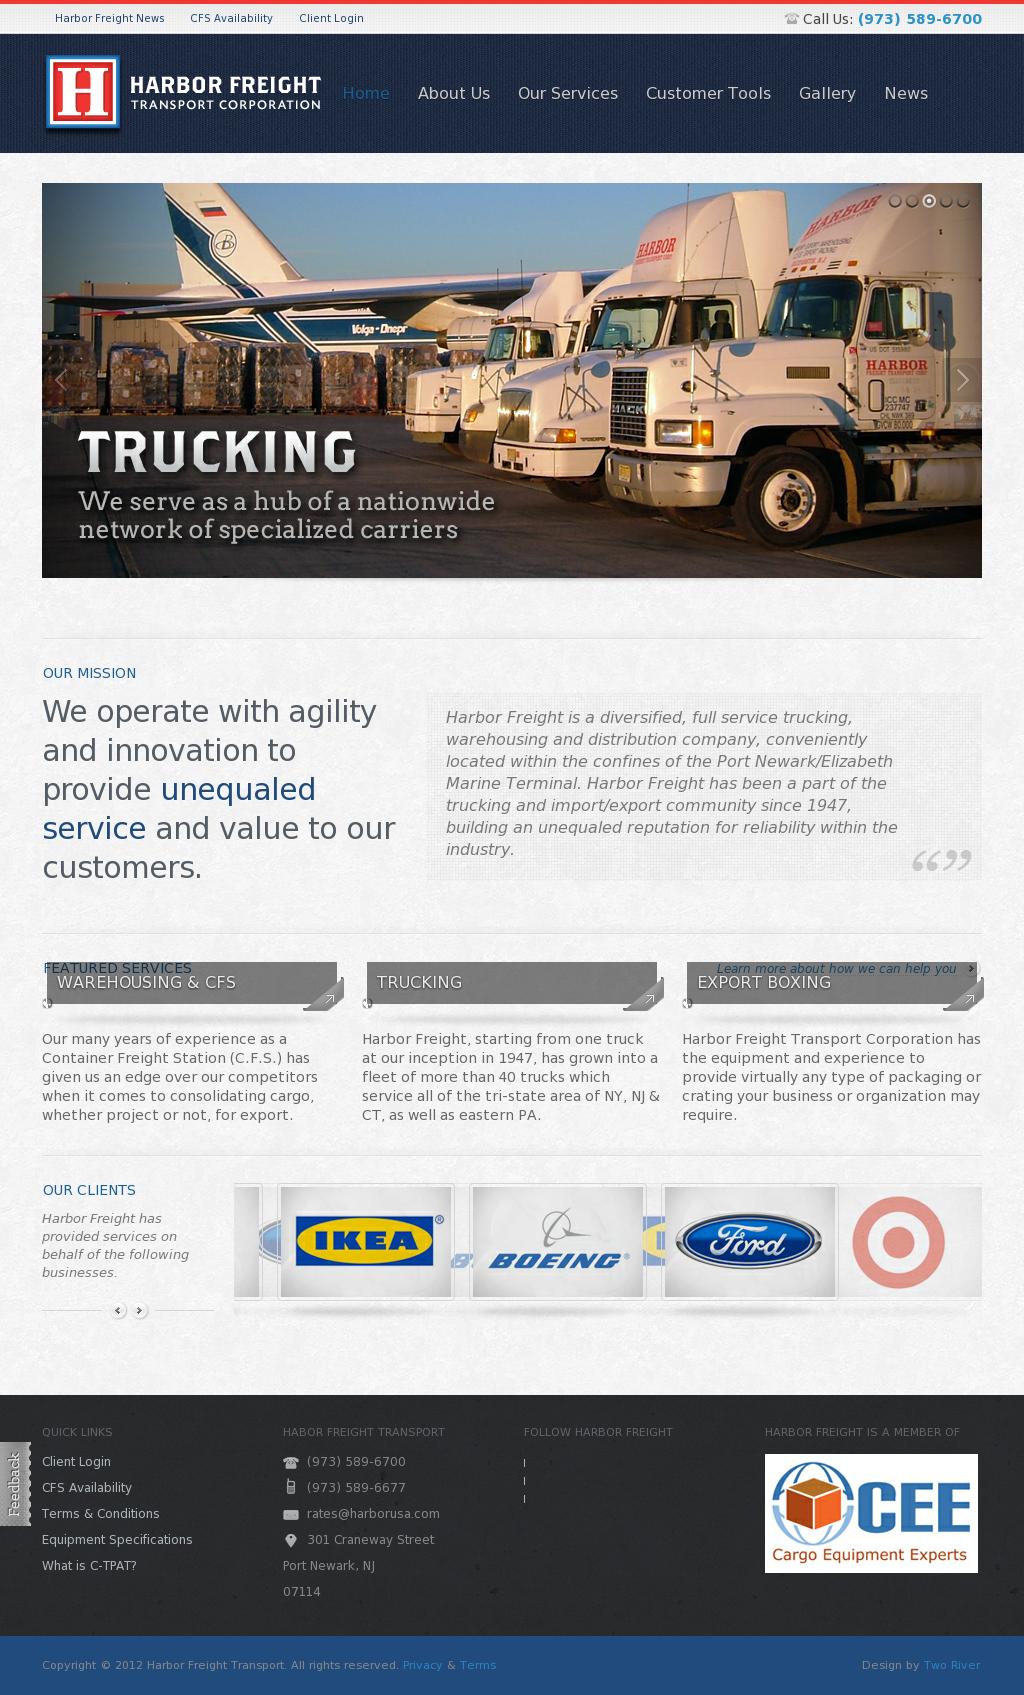 Harbor Freight Company Profile   Owler